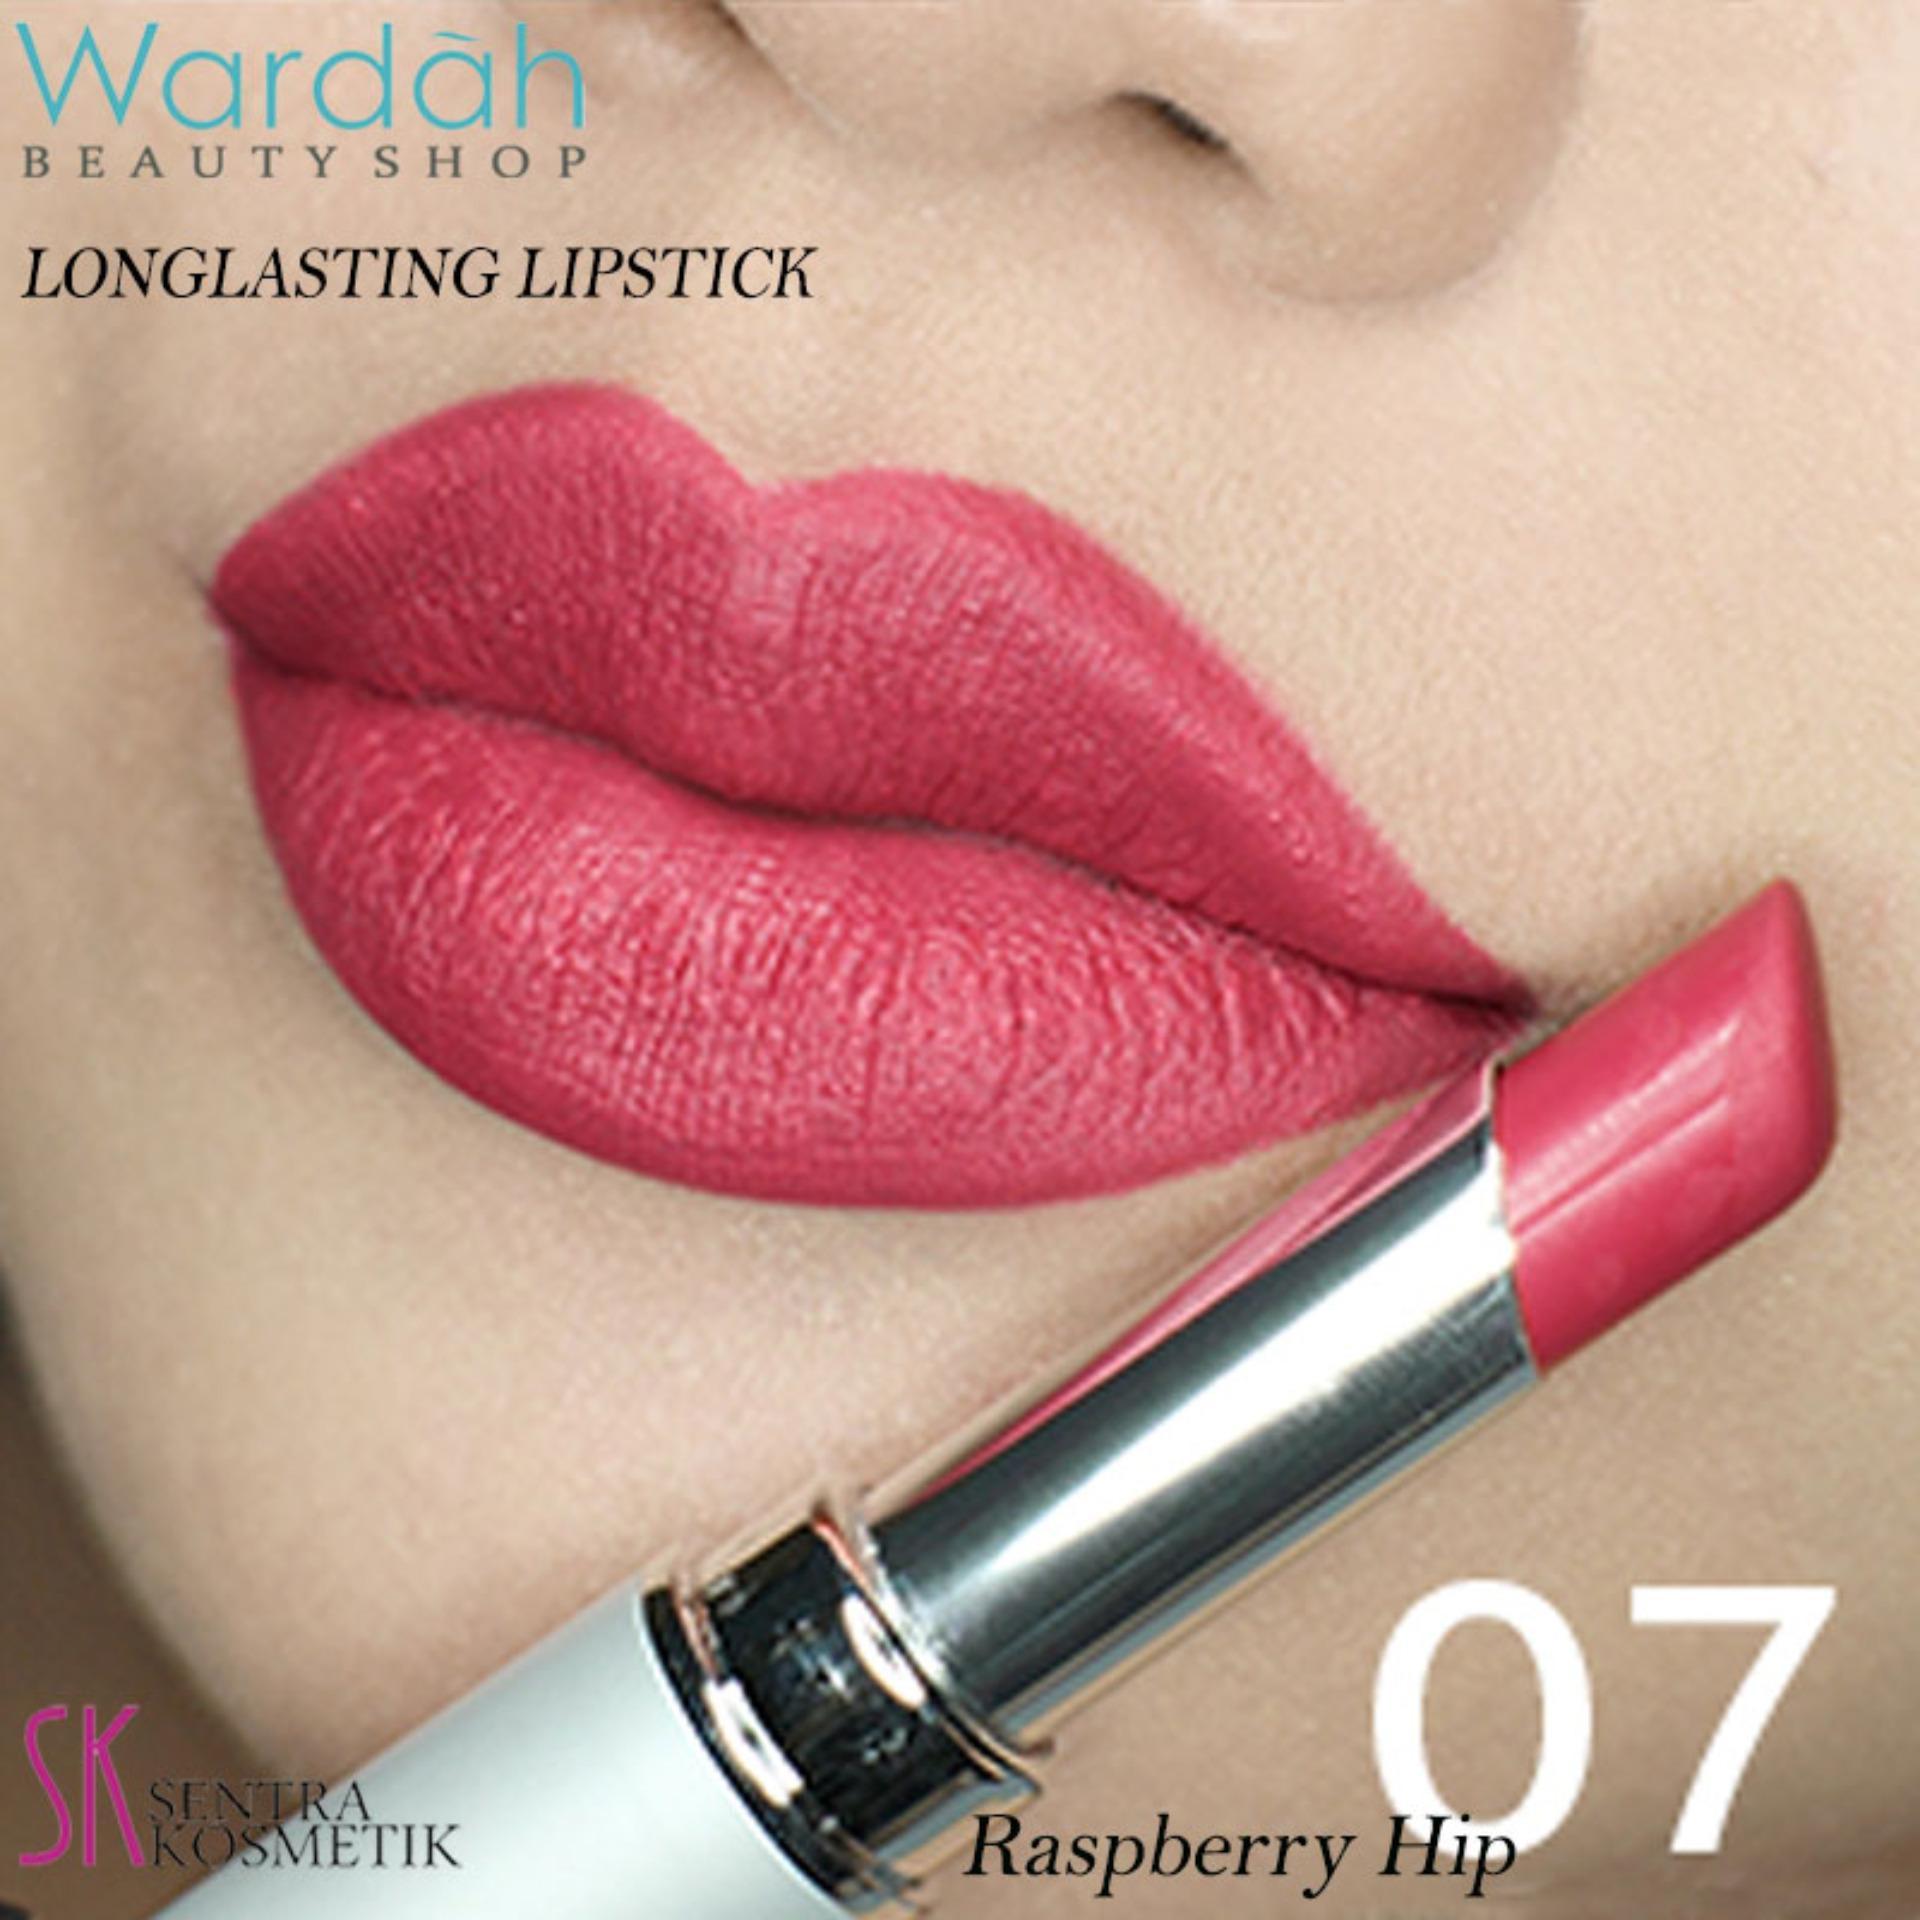 Wardah LONGLASTING Lipstick No.07 Raspberry Hip